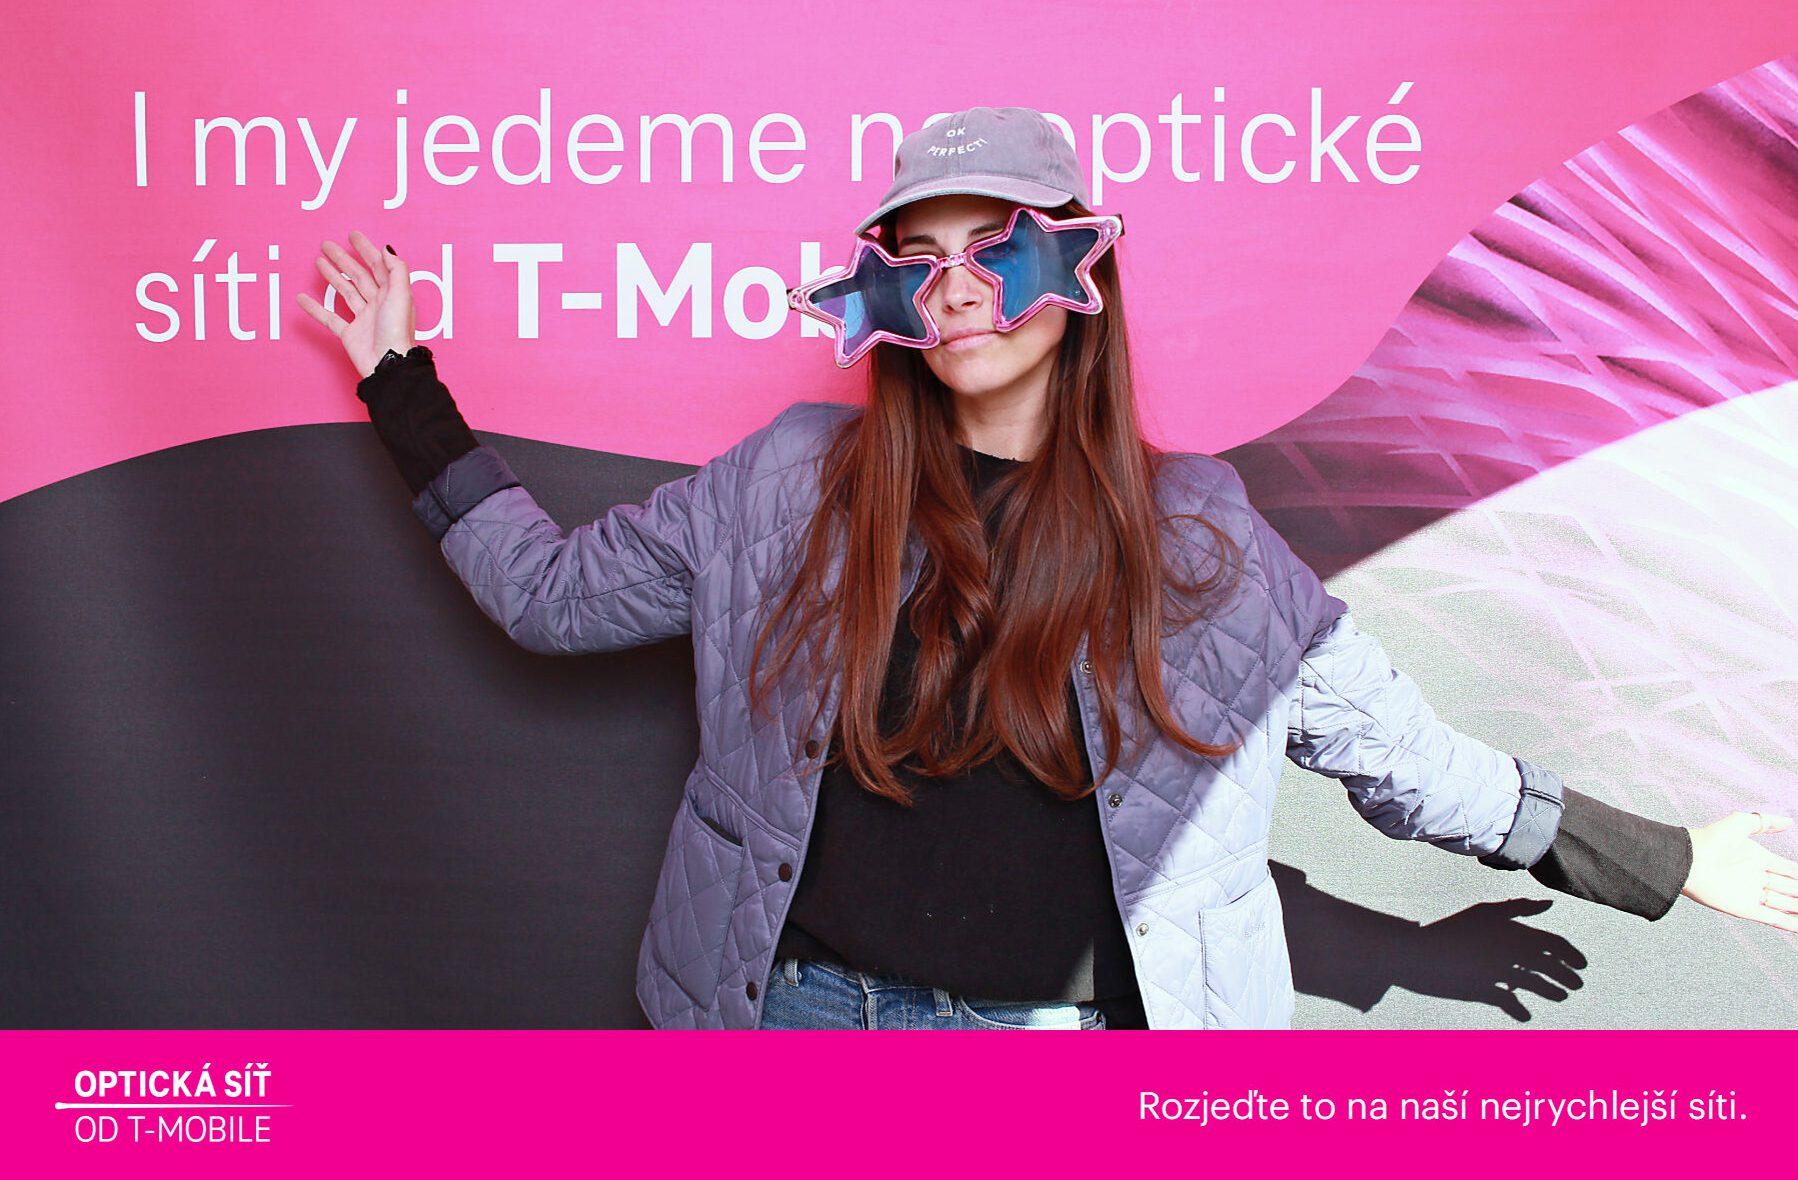 fotokoutek-ceske-budejovice-promo-akce-t-mobile-30-9-2021-755589